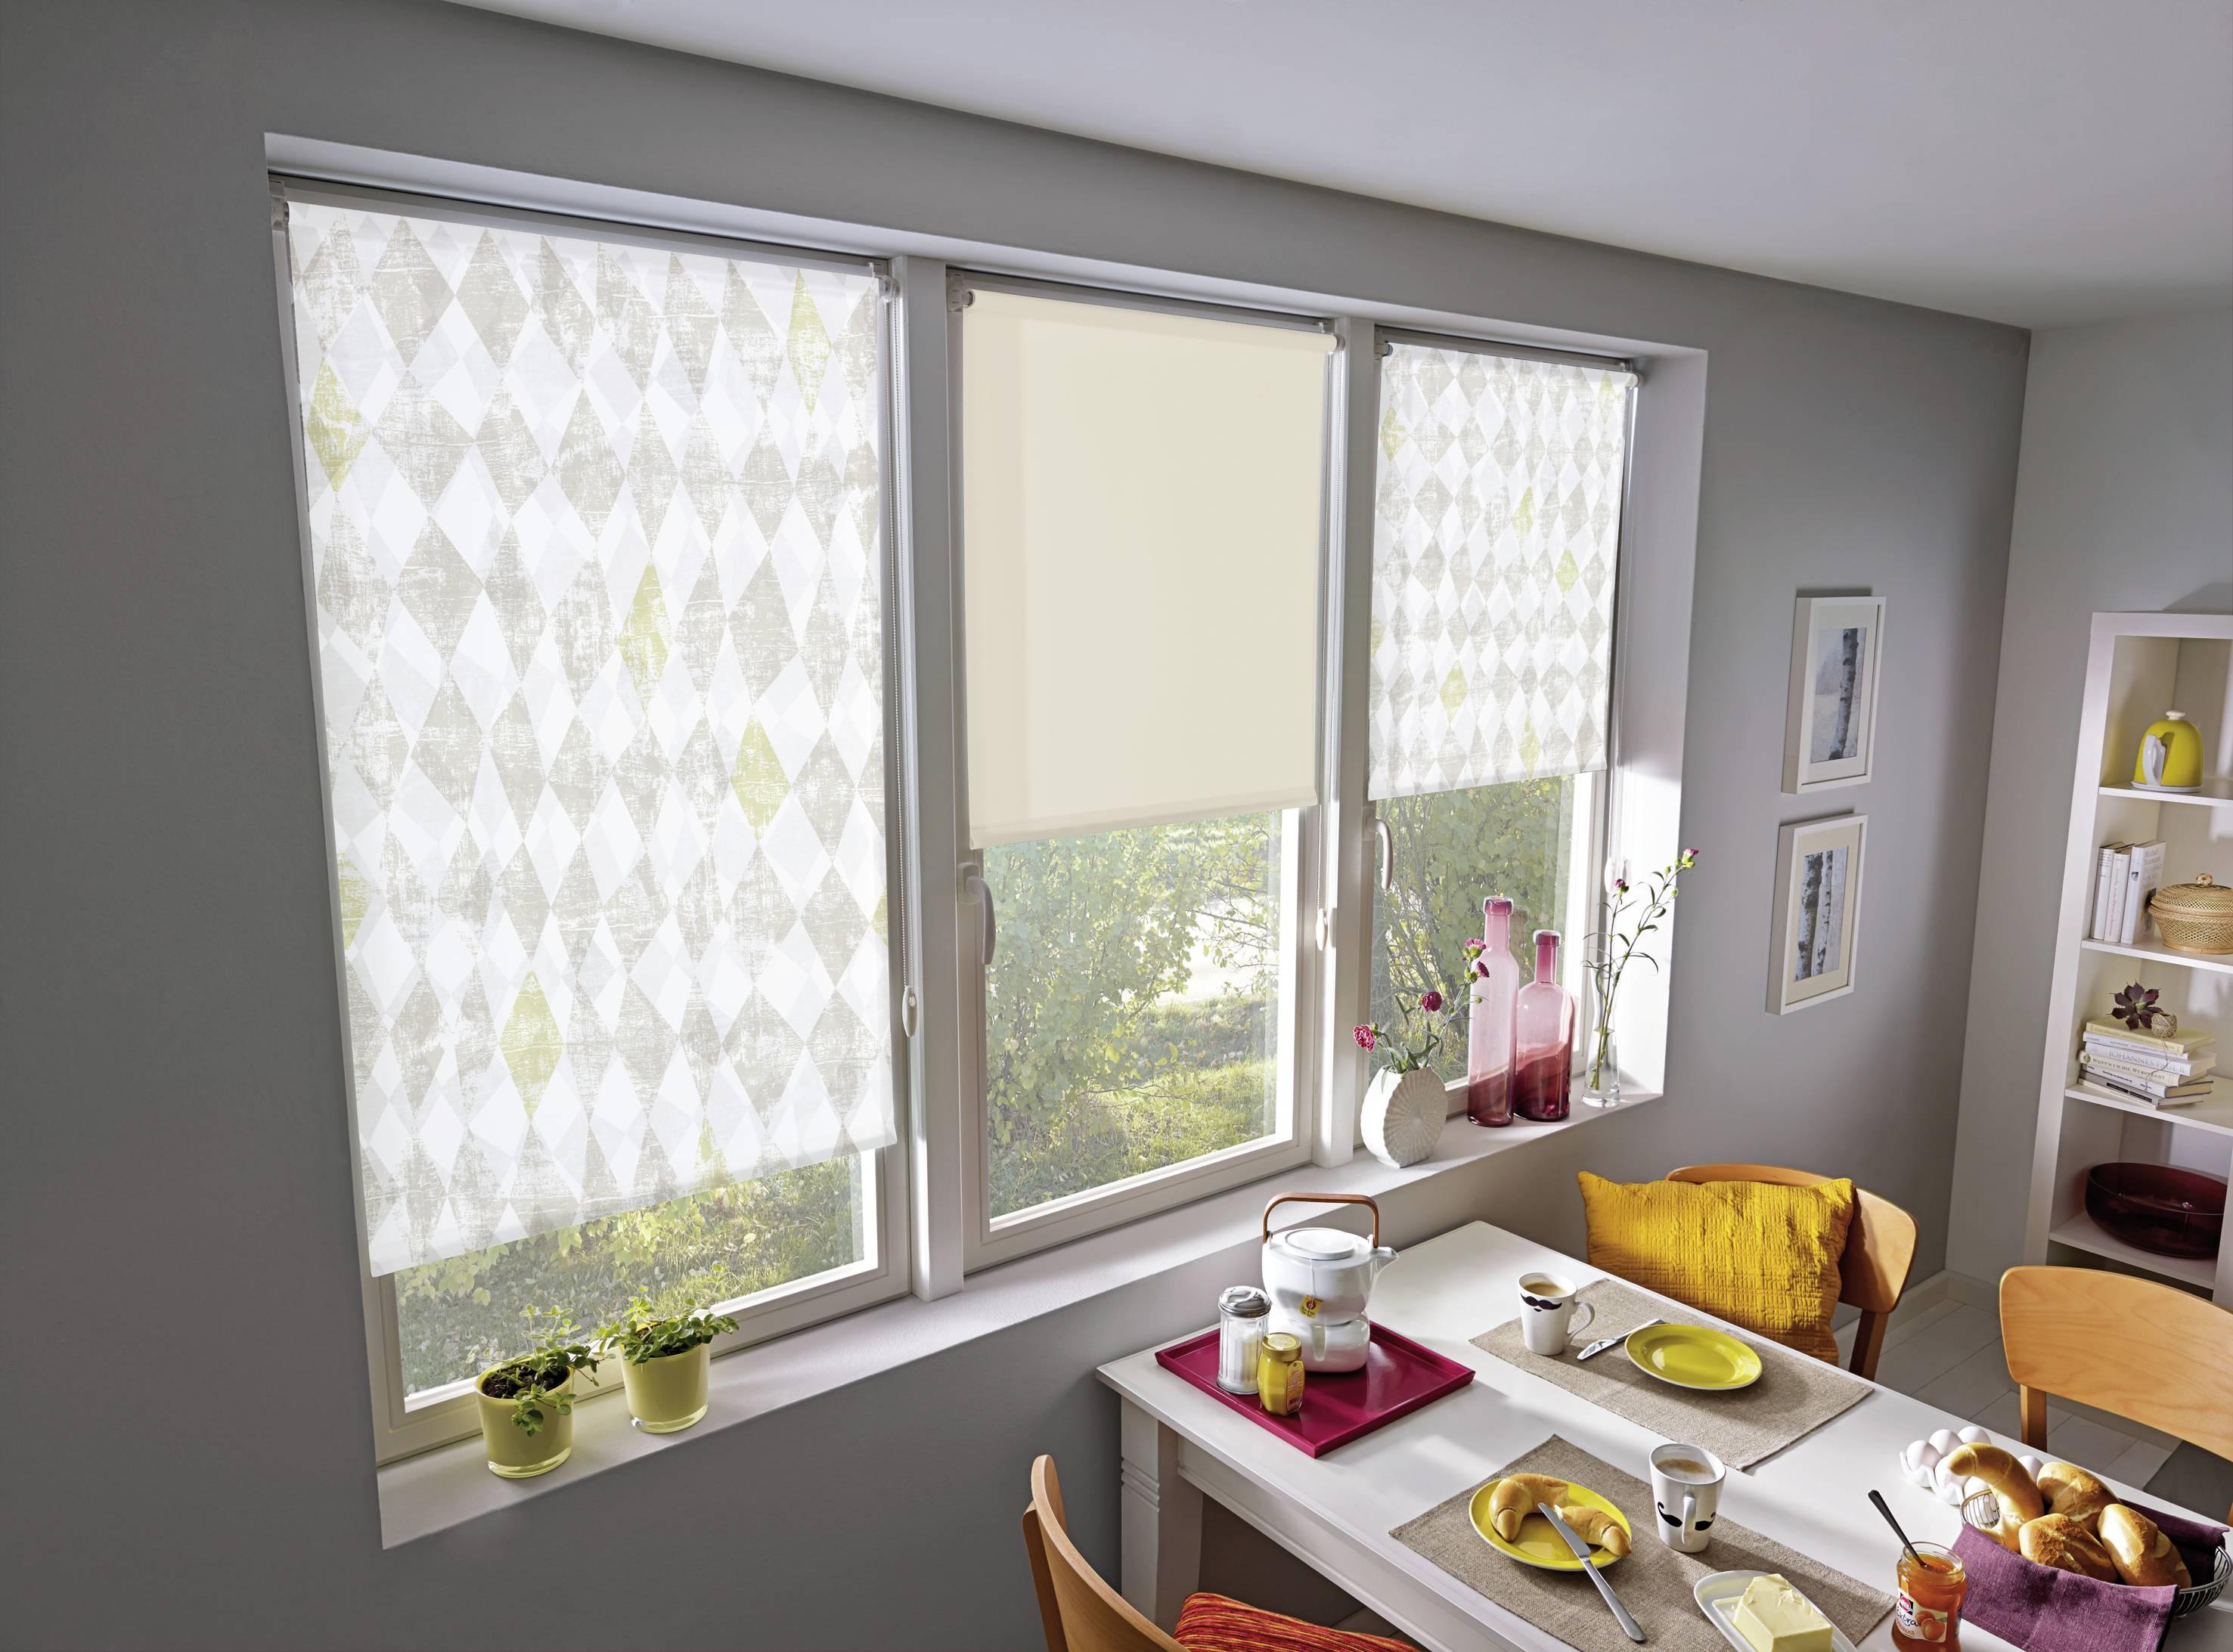 easyfix rollo beige 60 x 150 cm 36064. Black Bedroom Furniture Sets. Home Design Ideas